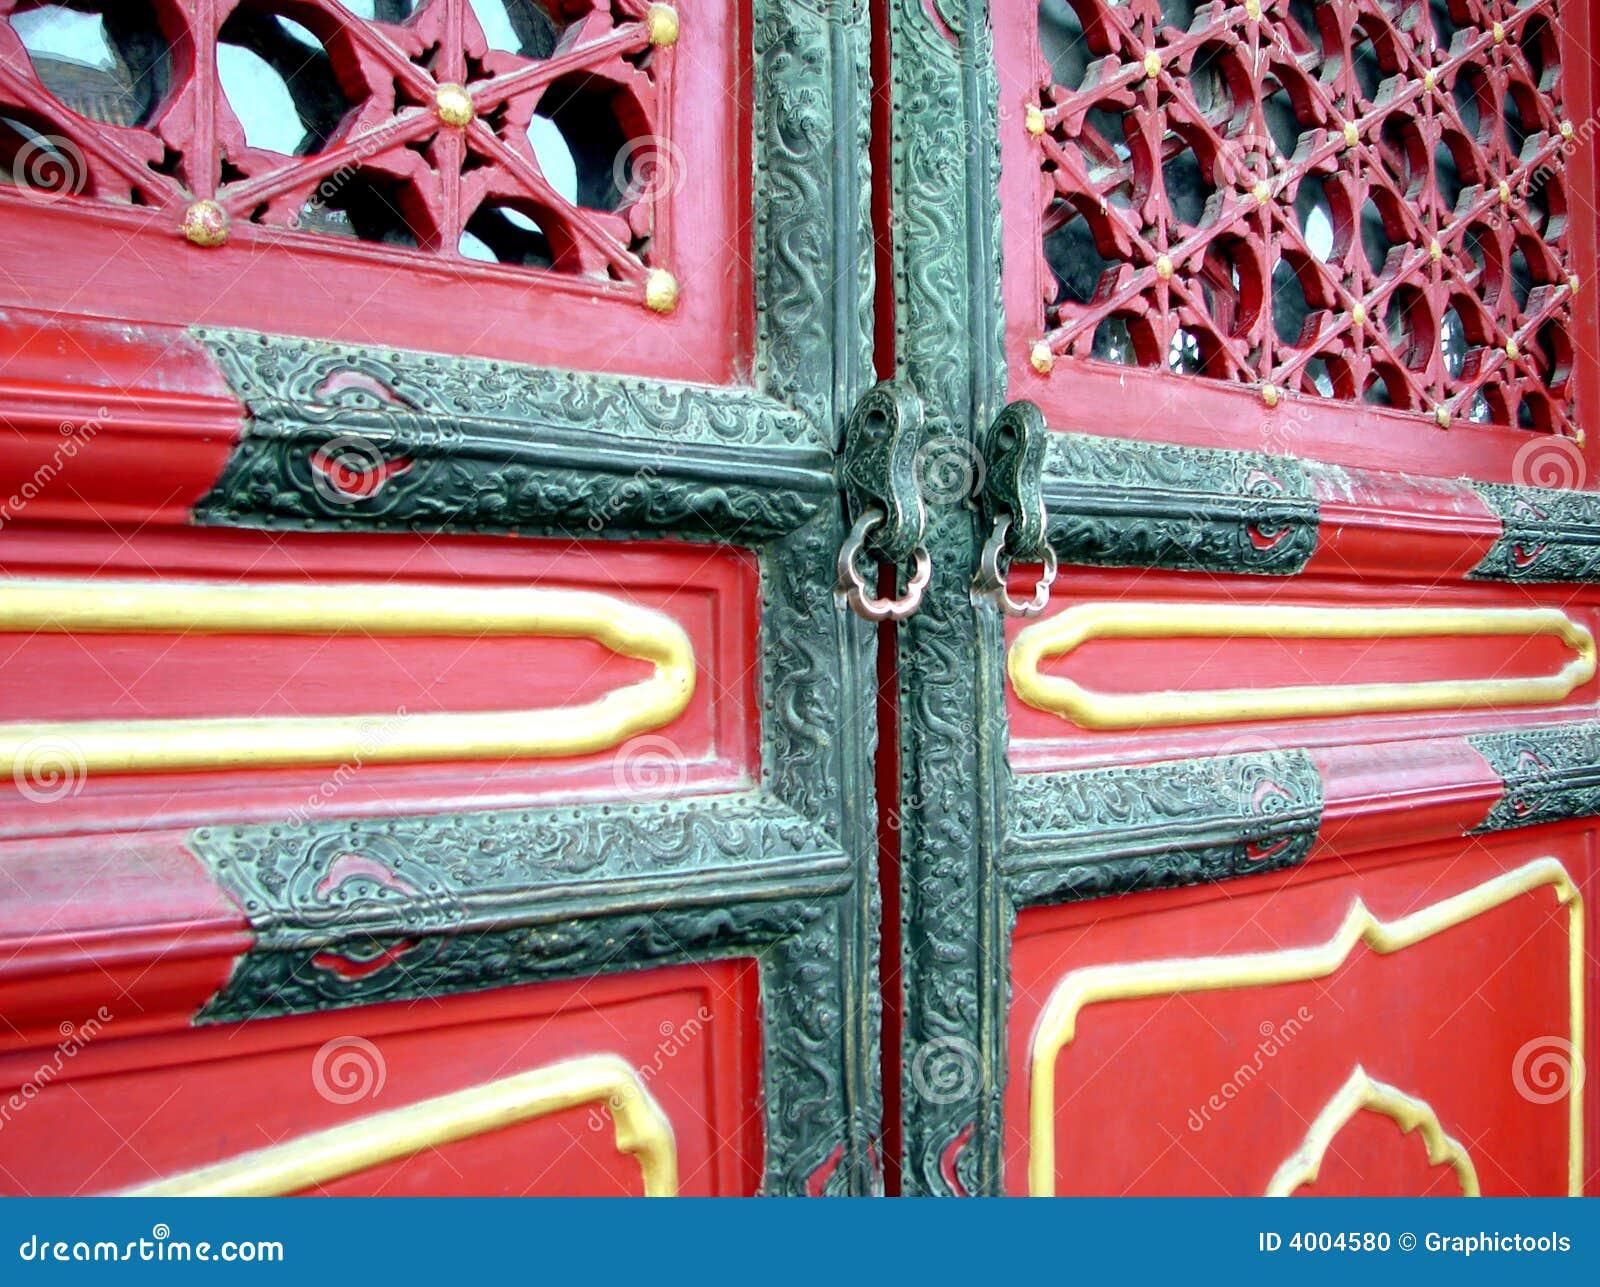 Trappe chinoise dans Pekin - porcelaine